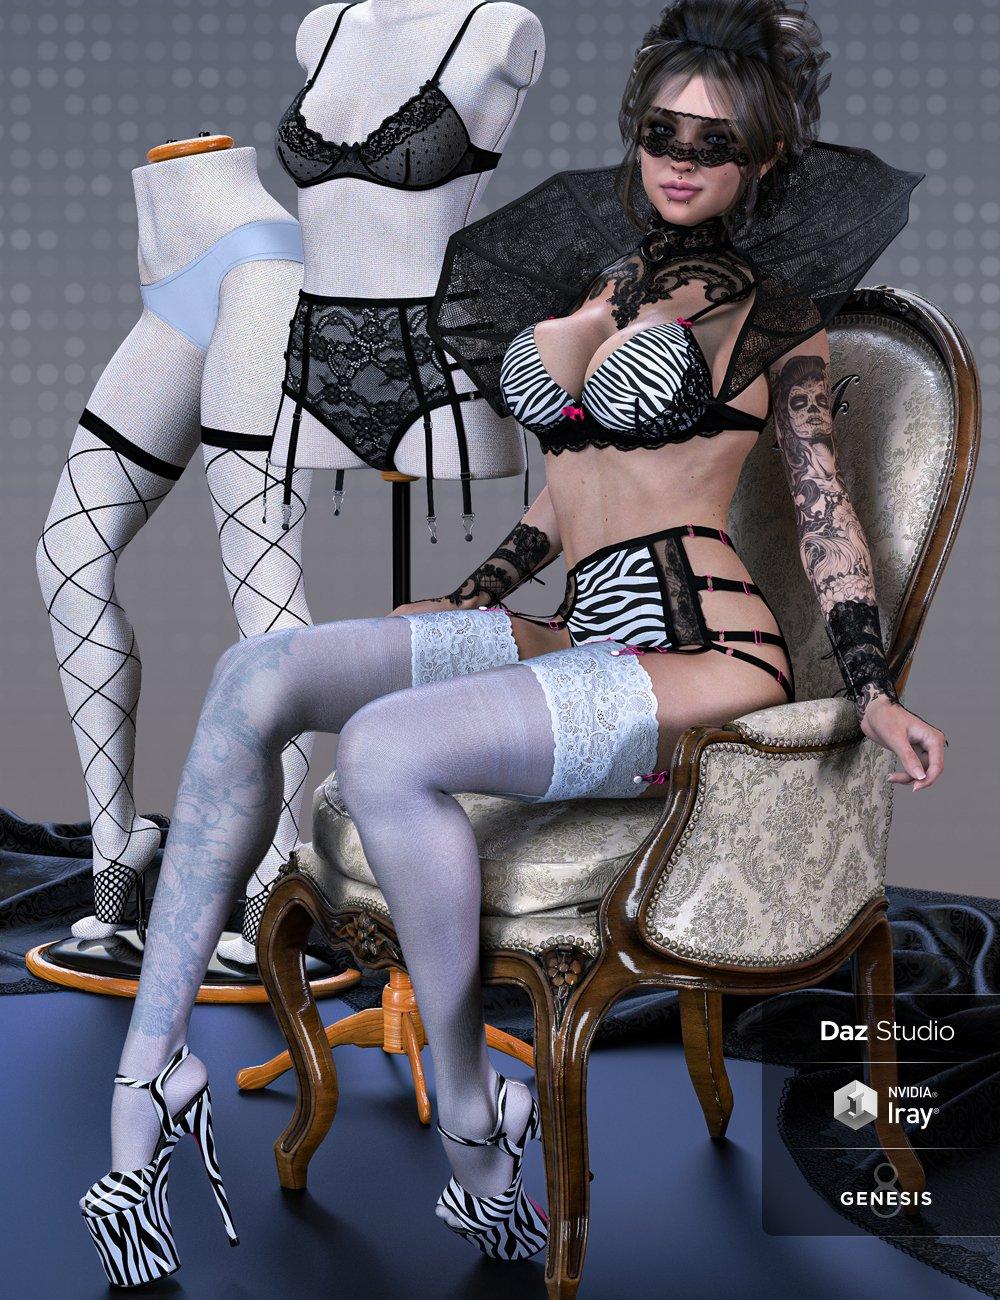 Masquerade Expansion for Mystique 2 by: Herschel Hoffmeyer, 3D Models by Daz 3D